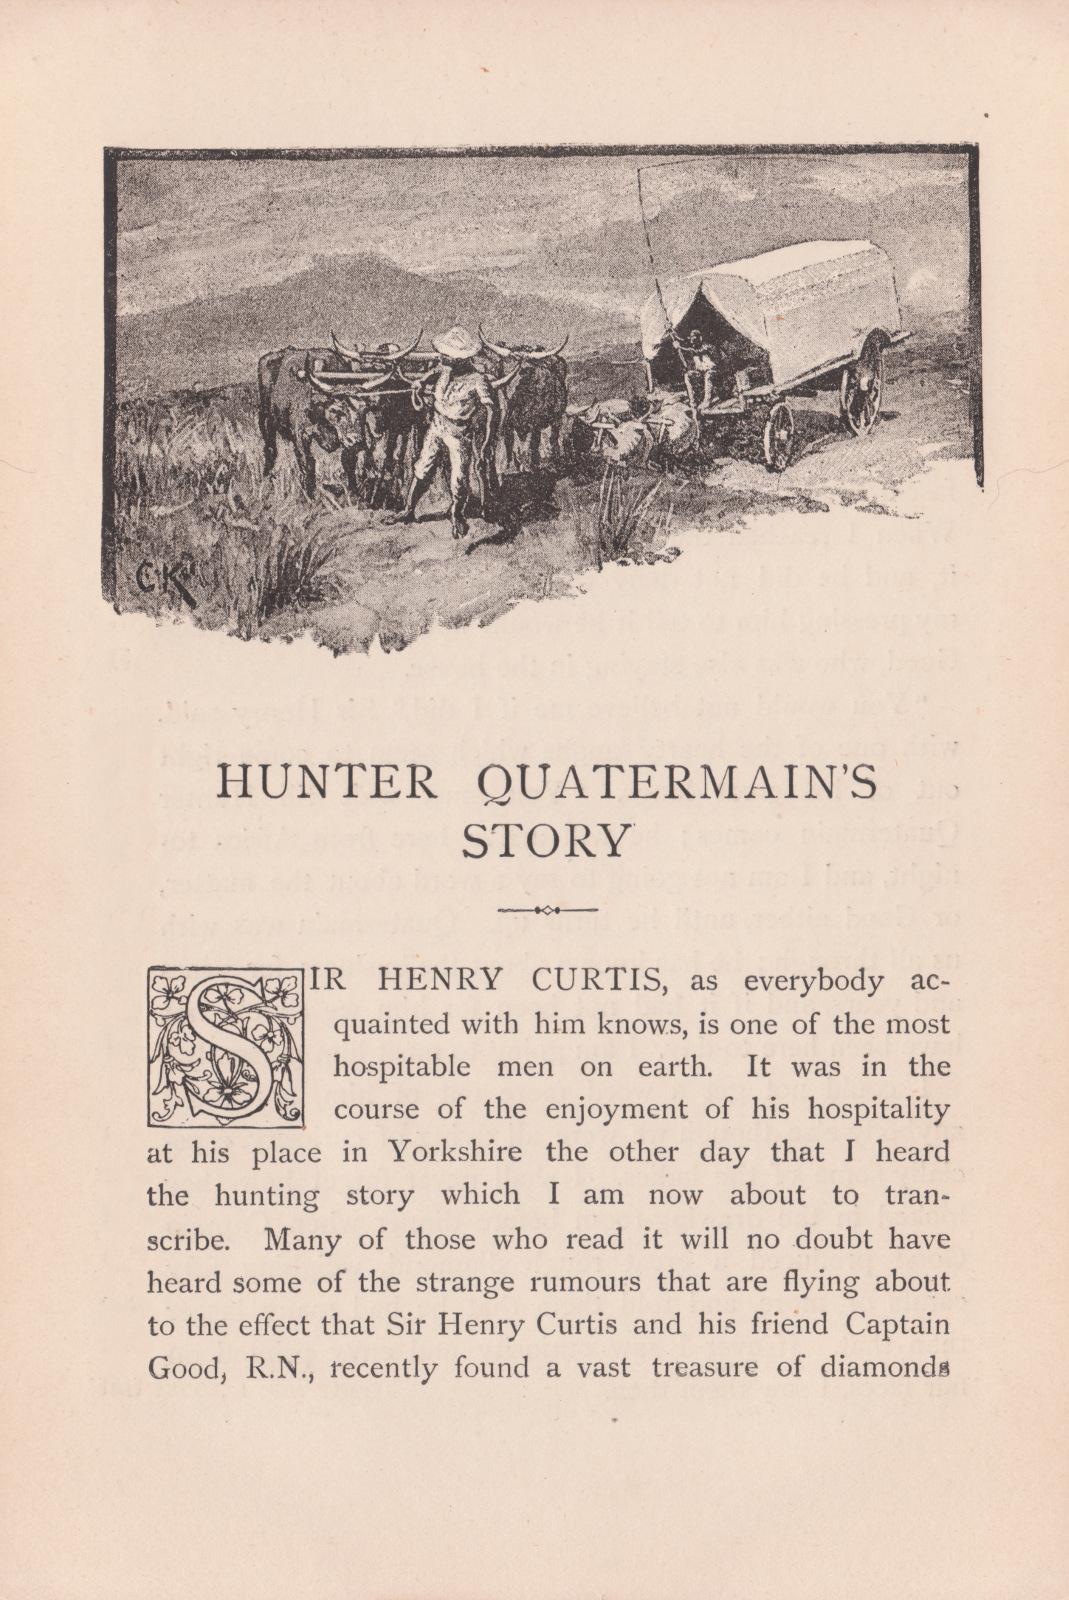 Hunterquatermaingriffith227